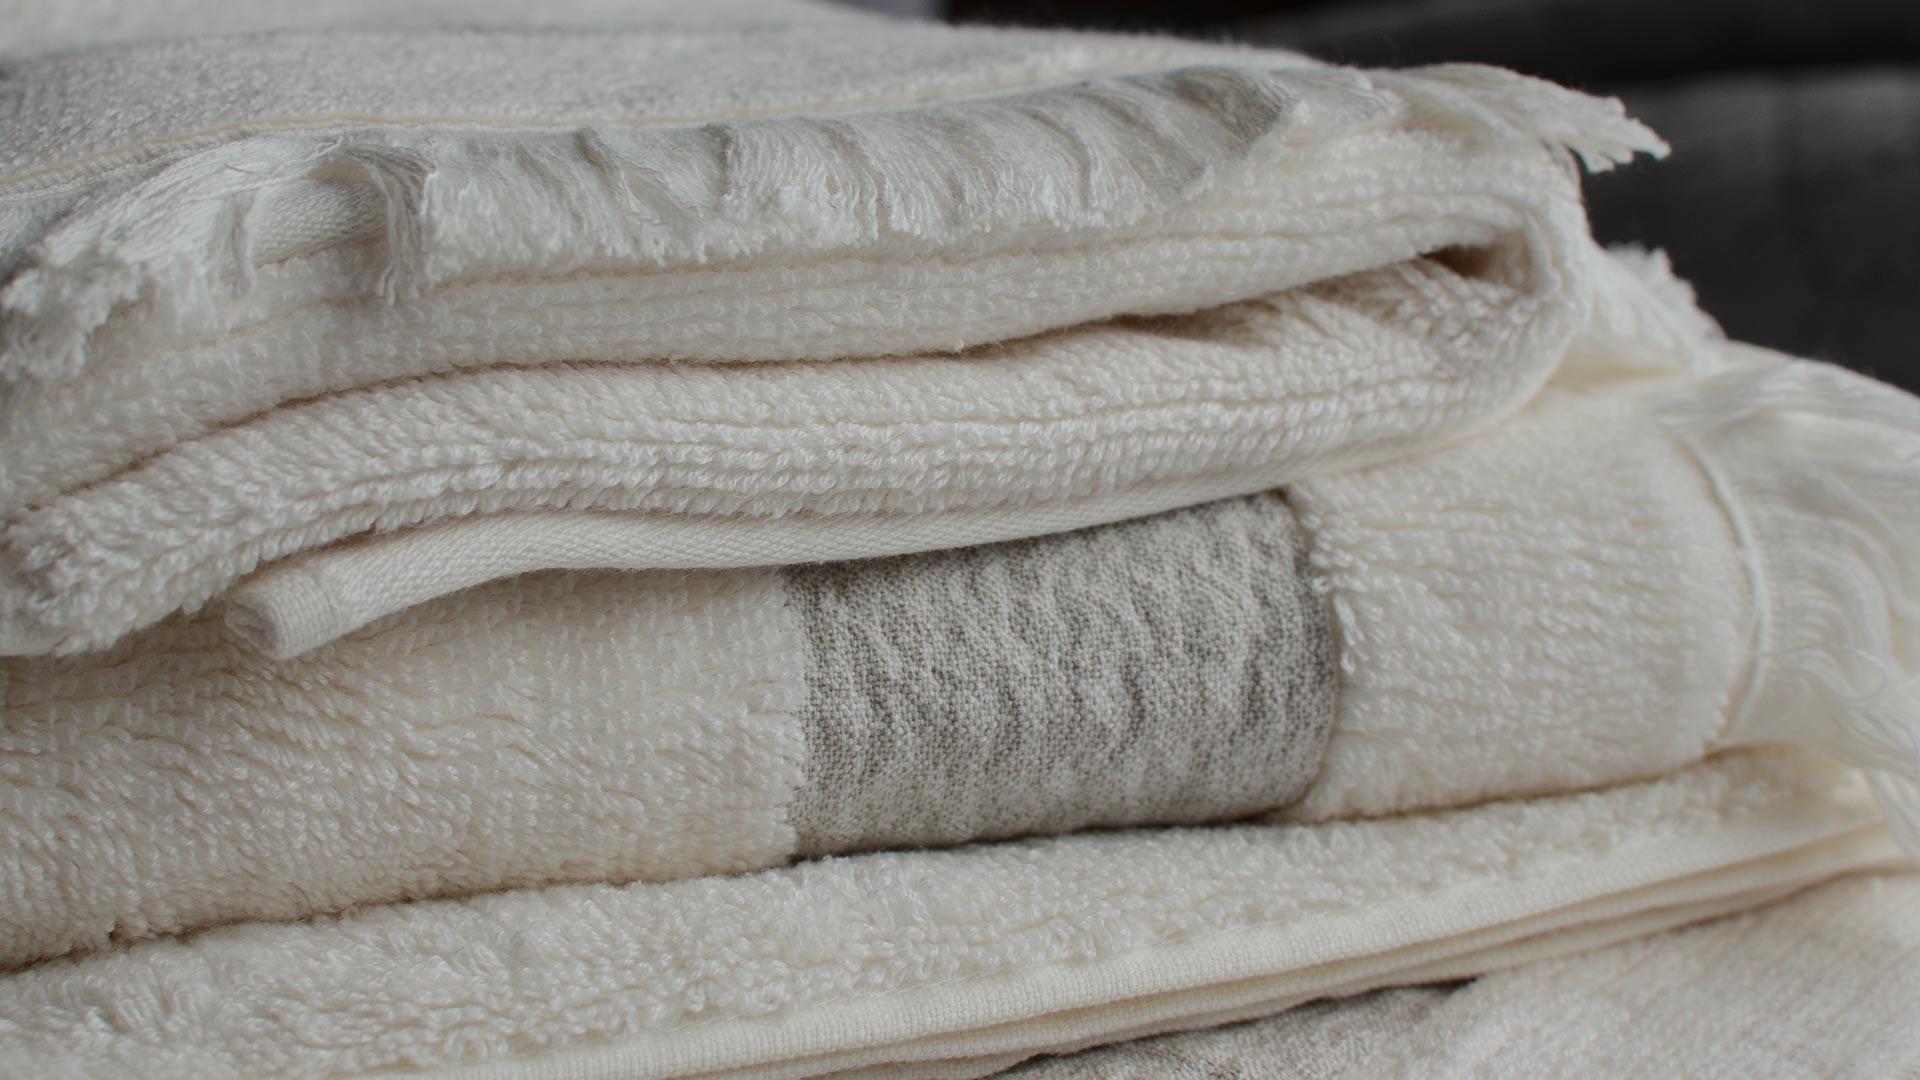 soft-fringed-towels-stack